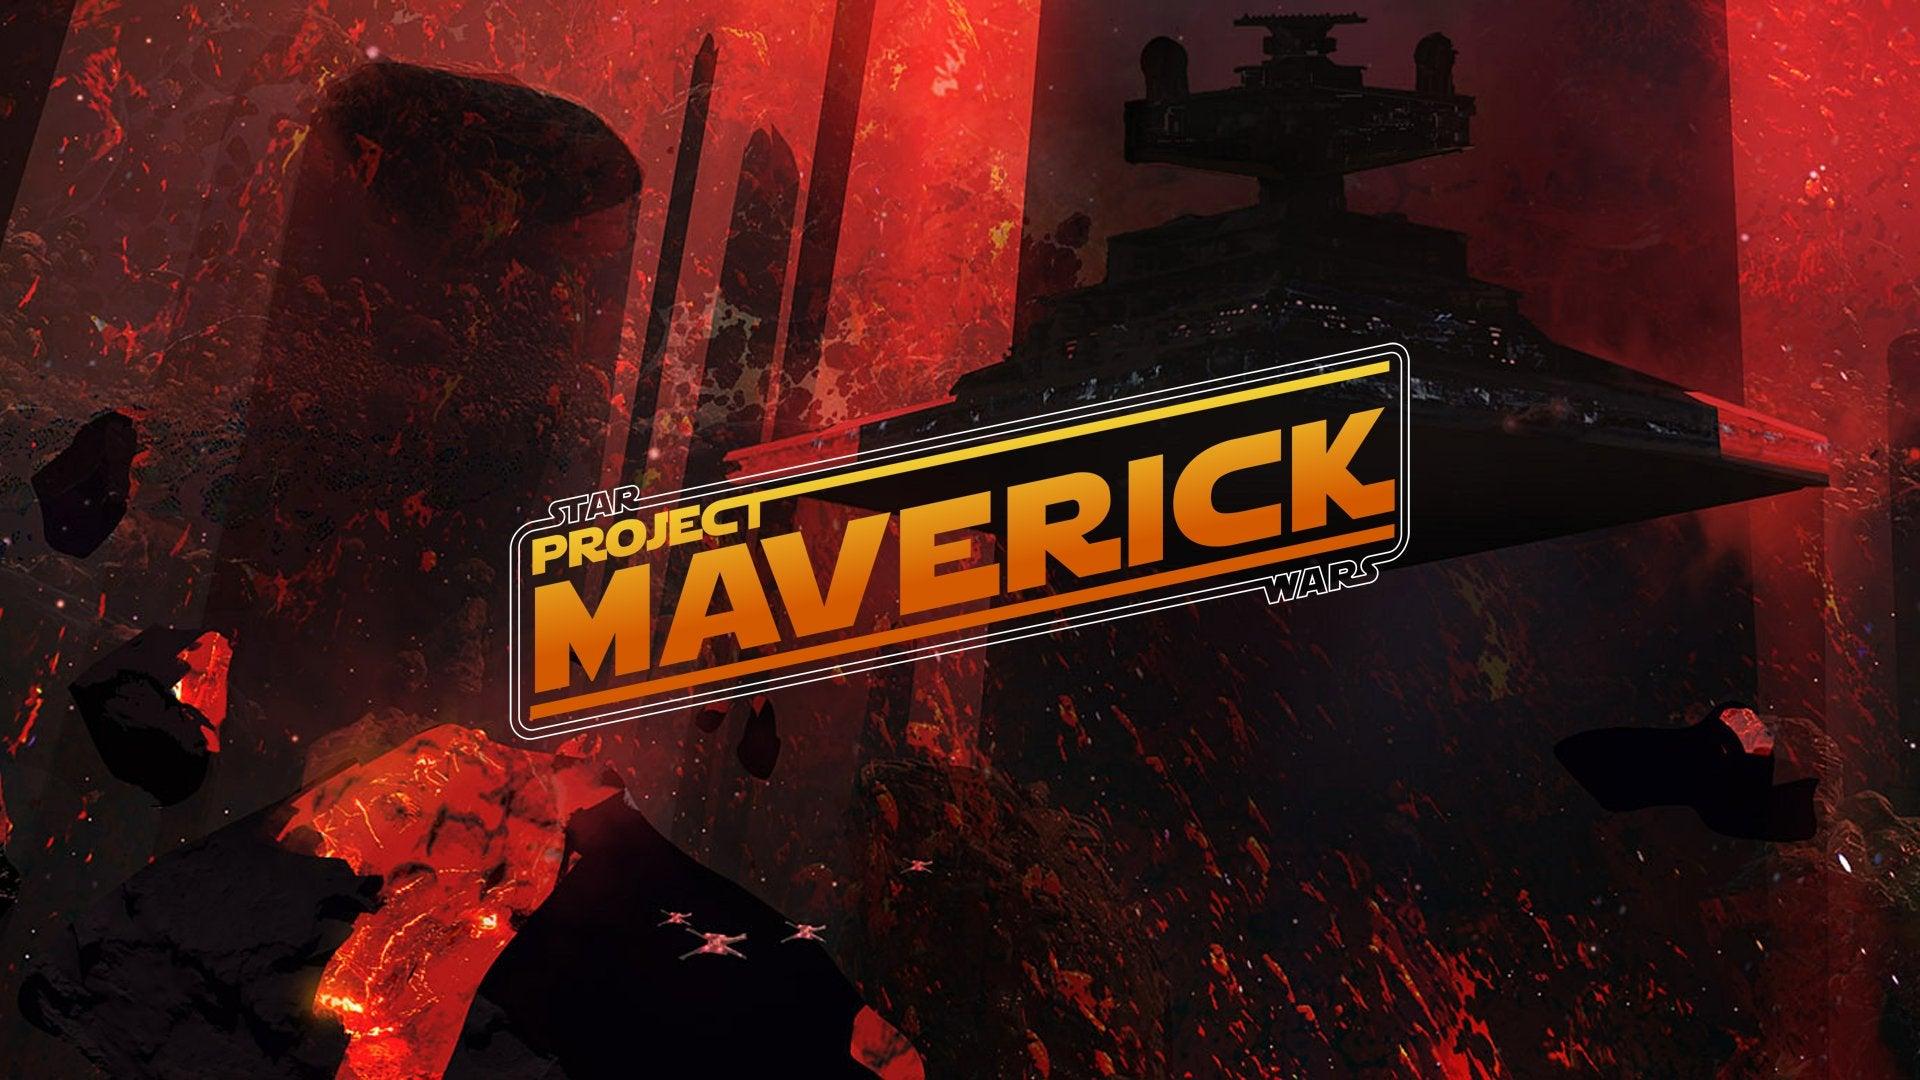 Image for Star Wars: Maverick could be revealed next week - rumor